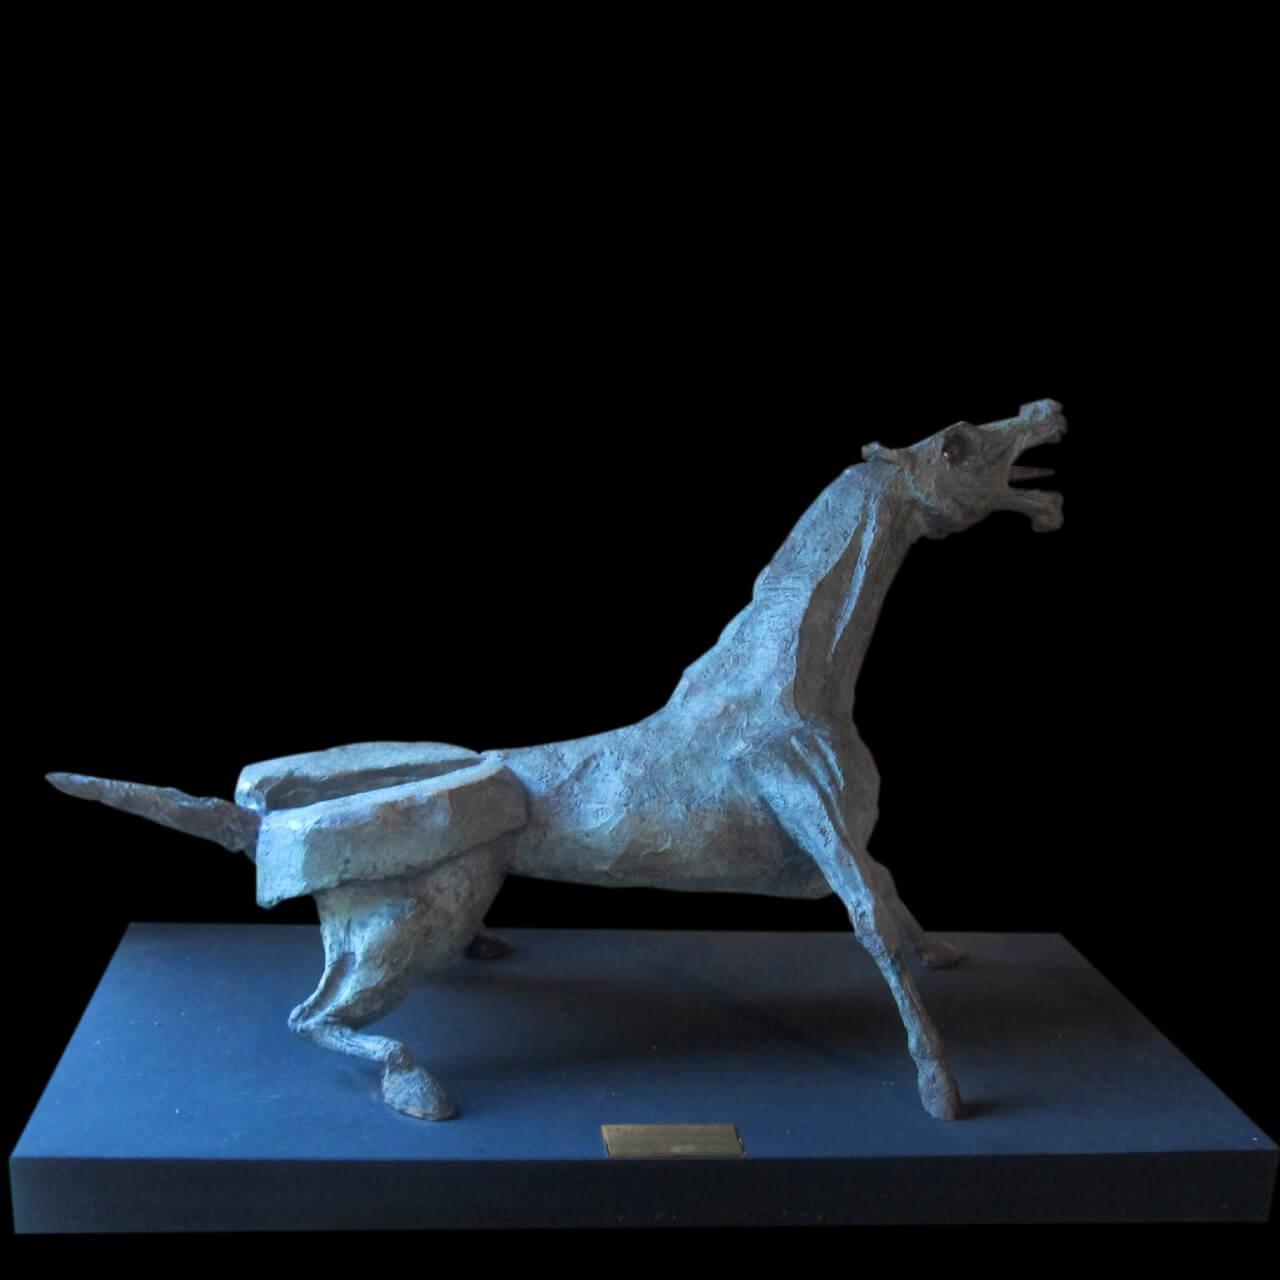 mario pavesi italian sculptur painter bronze horse Guernica Picasso